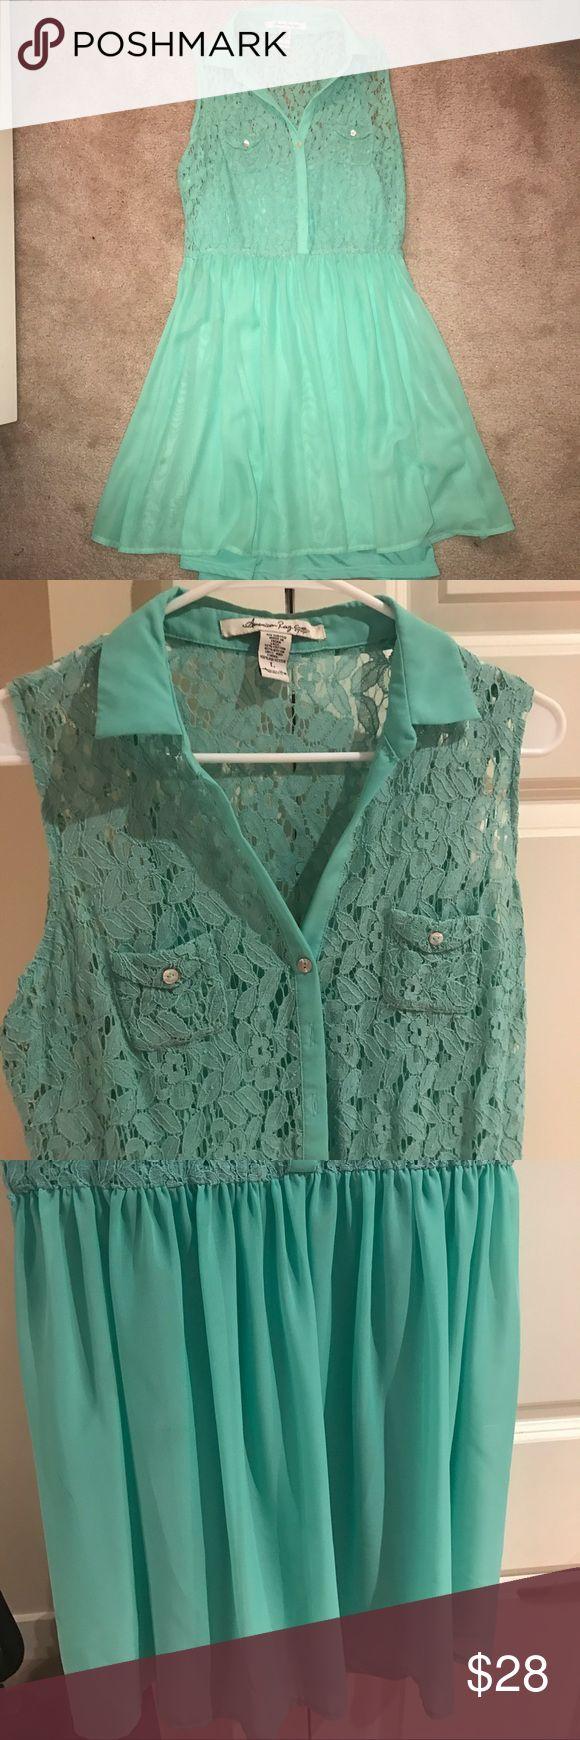 Womens' American Rag dress Super cute mint green American Rag dress. American Rag Dresses